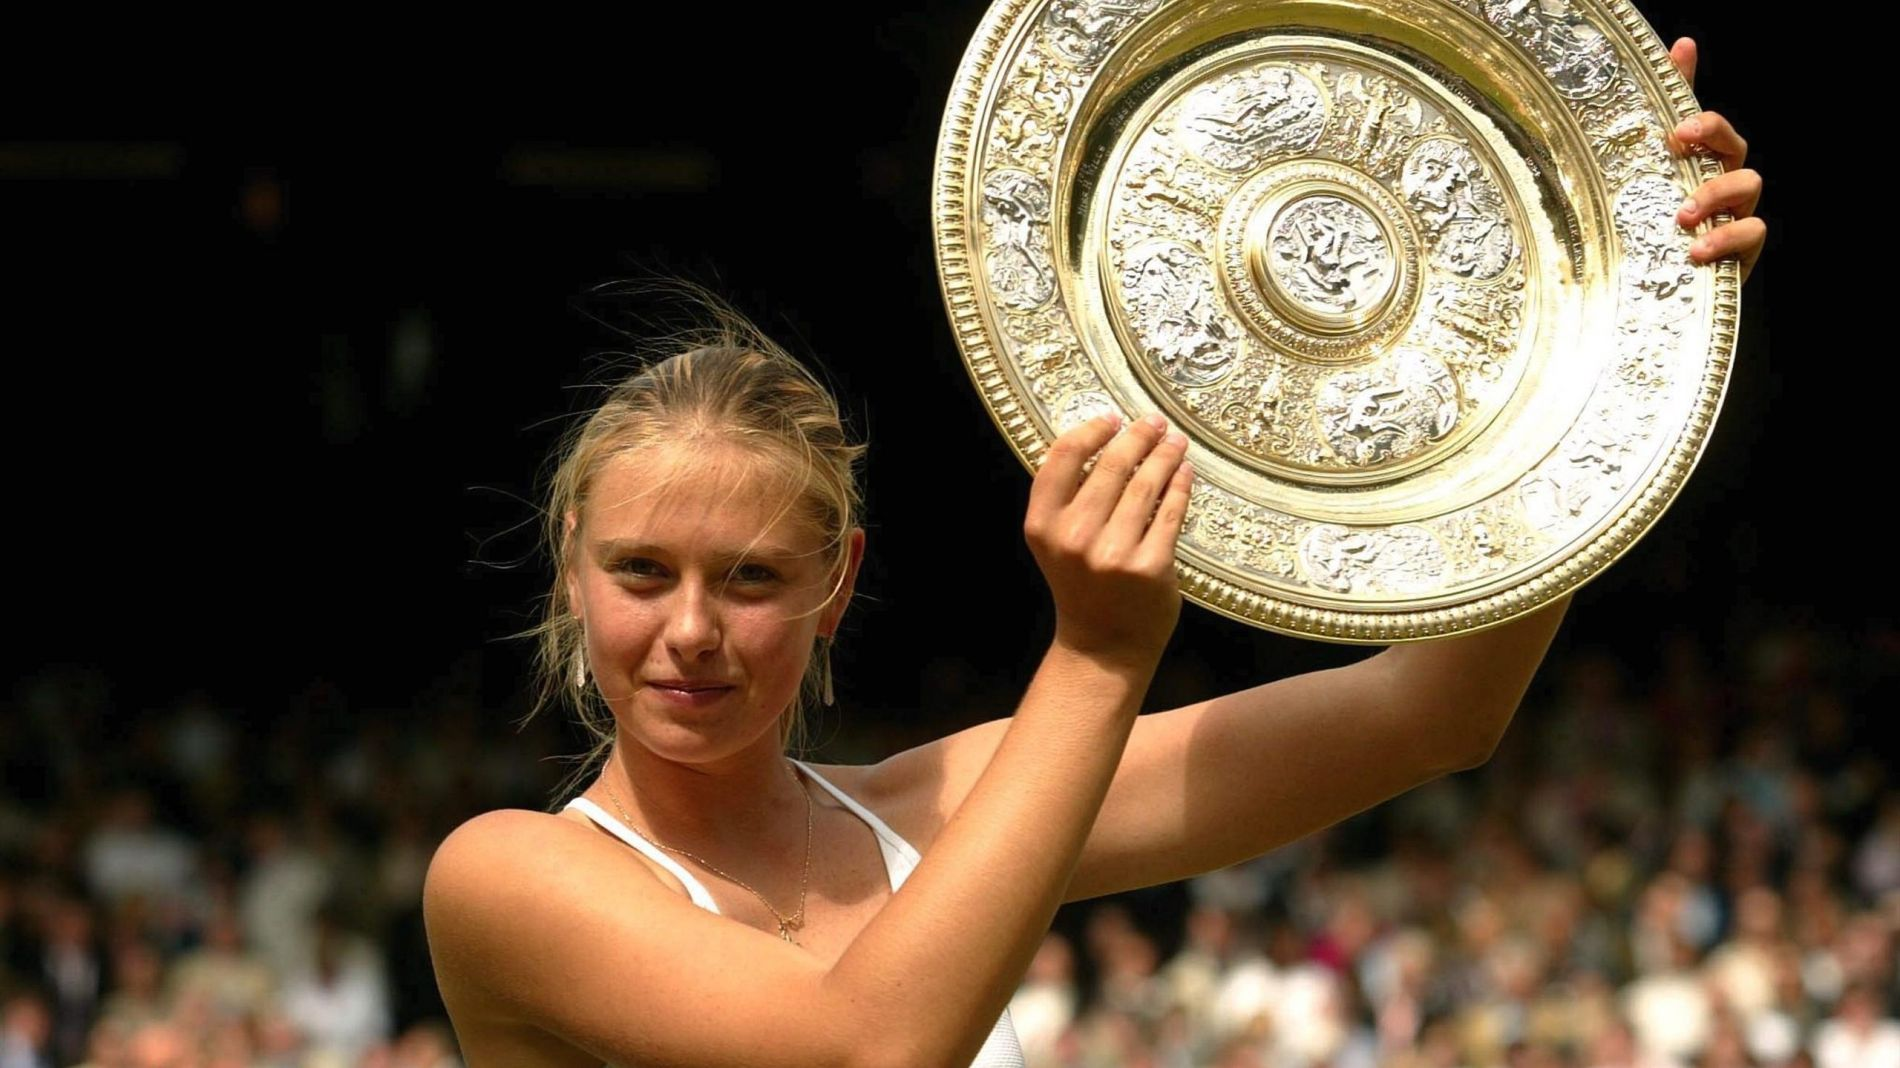 Maria Sharapova, Wimbledon 2004